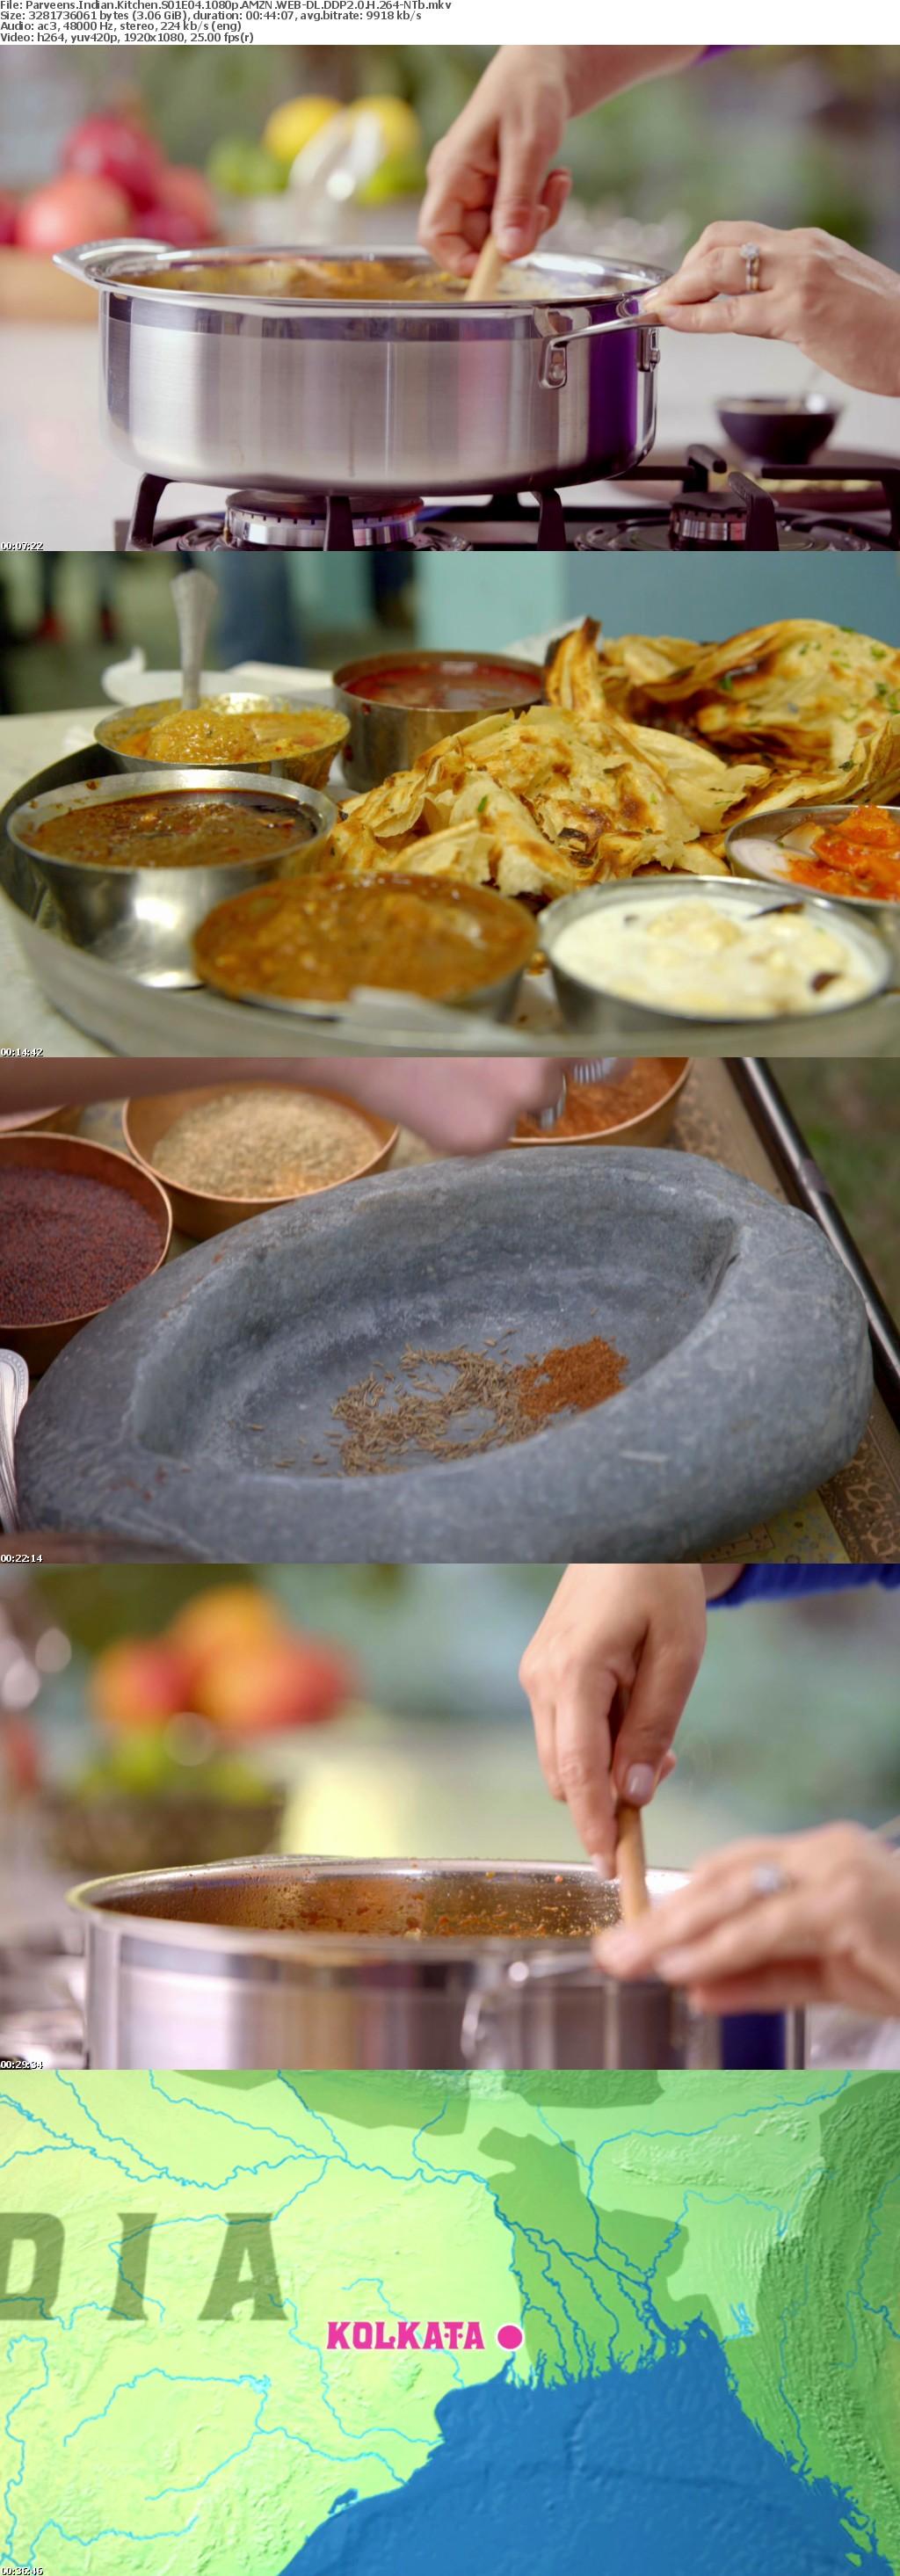 Parveens Indian Kitchen S01E04 1080p AMZN WEB-DL DDP2 0 H 264-NTb